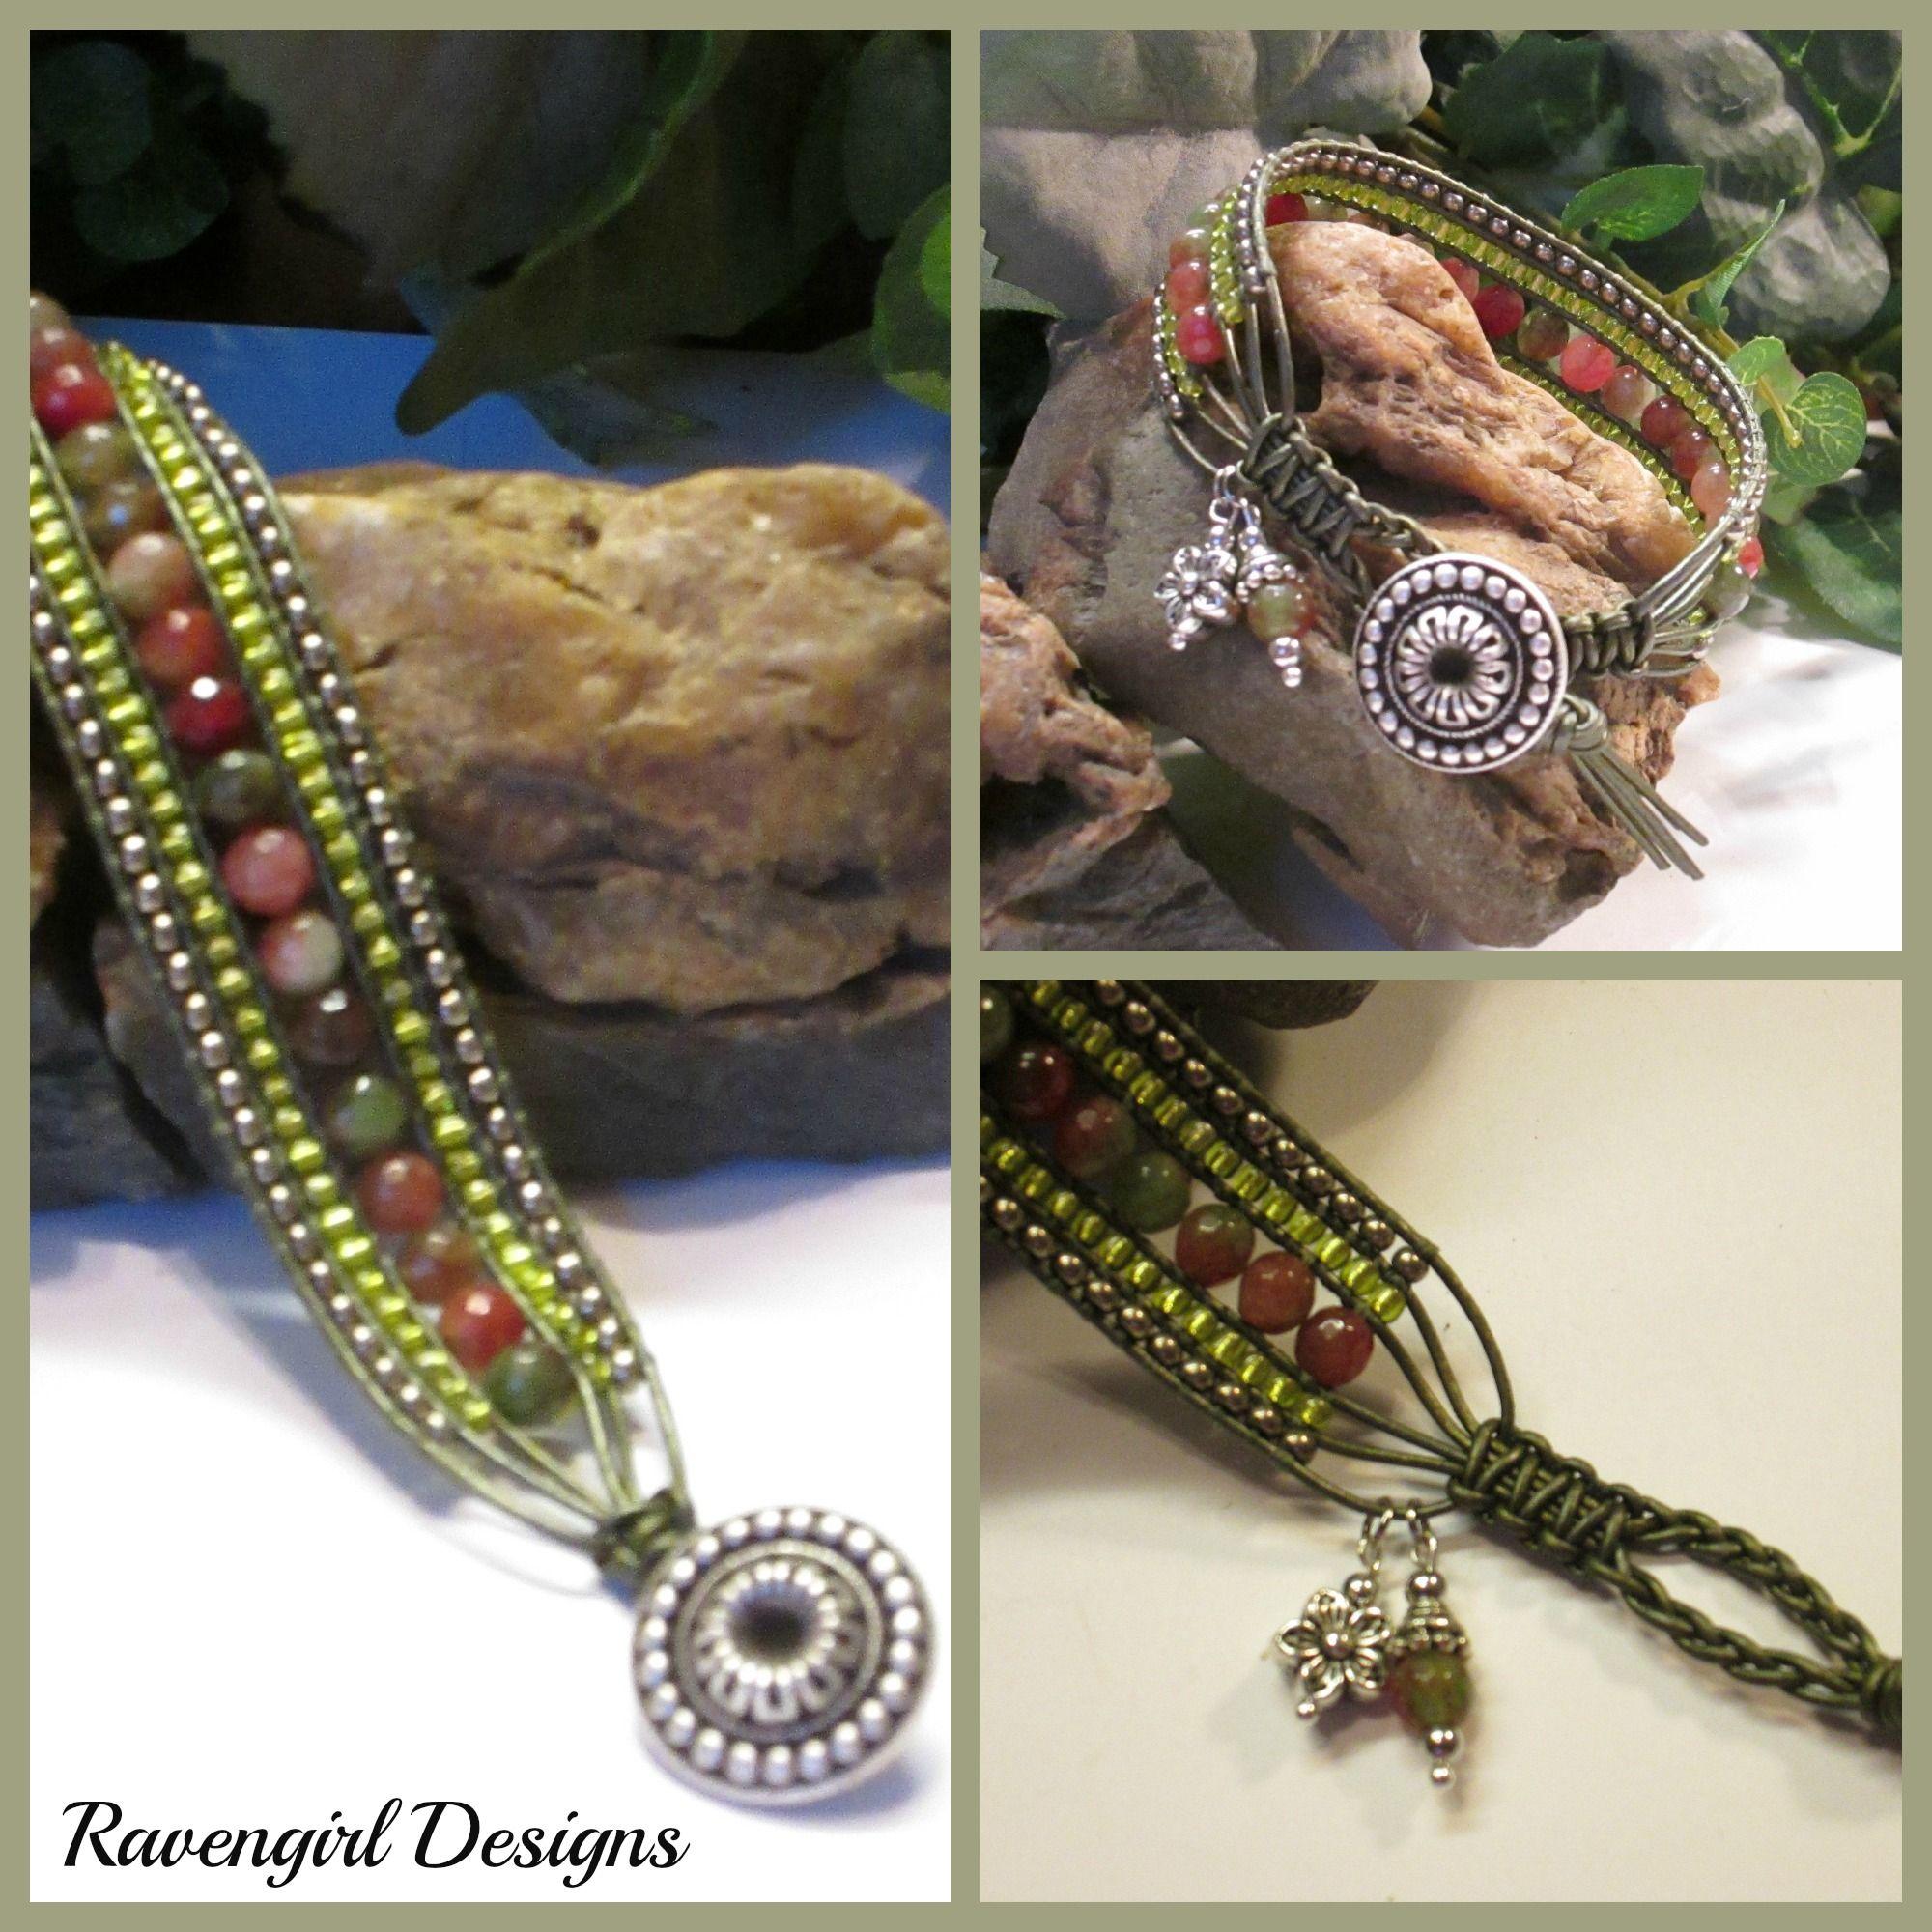 """MOSS GARDEN 5 Row Leather Wrap Bracelet Handmade by"